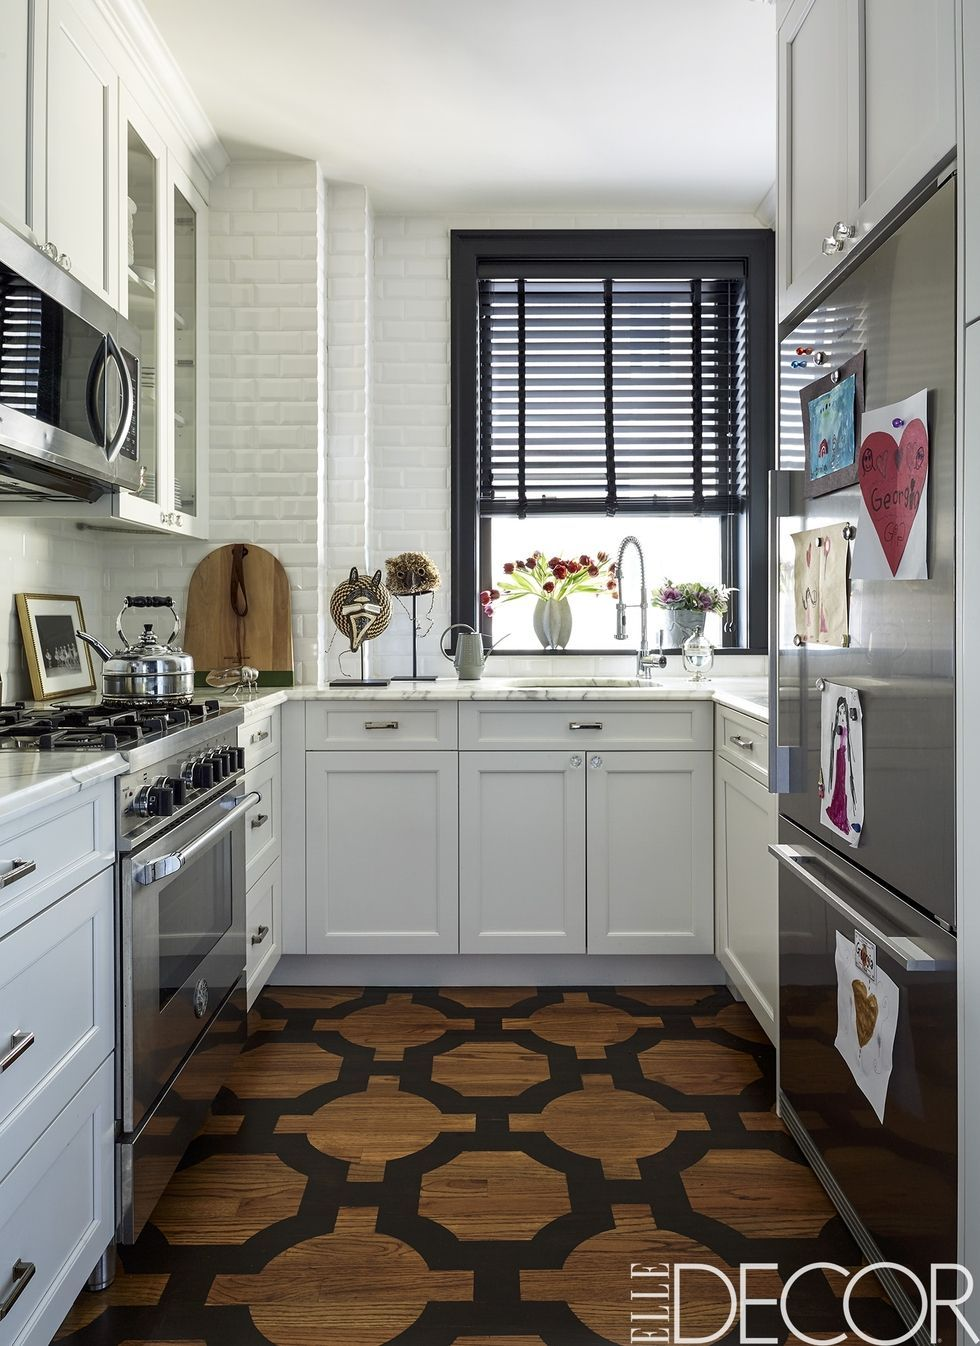 Marvelous 50 Small Kitchen Design Ideas Decorating Tiny Kitchens Rh Elledecor Com  Small White Kitchen Design Images